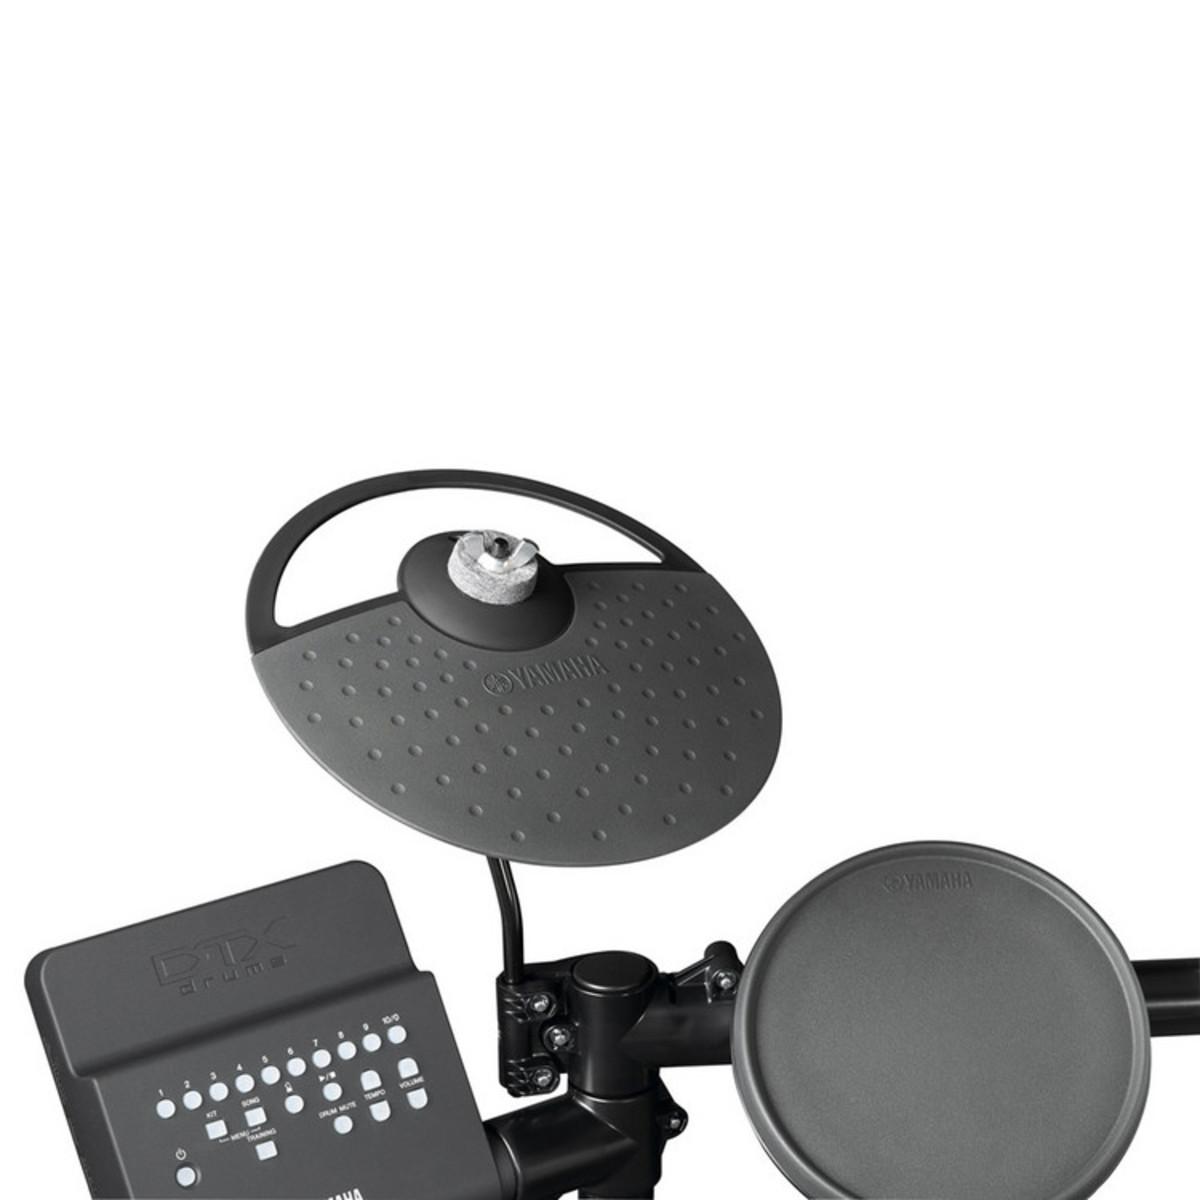 yamaha dtx400k kit de batterie lectronique gear4music. Black Bedroom Furniture Sets. Home Design Ideas